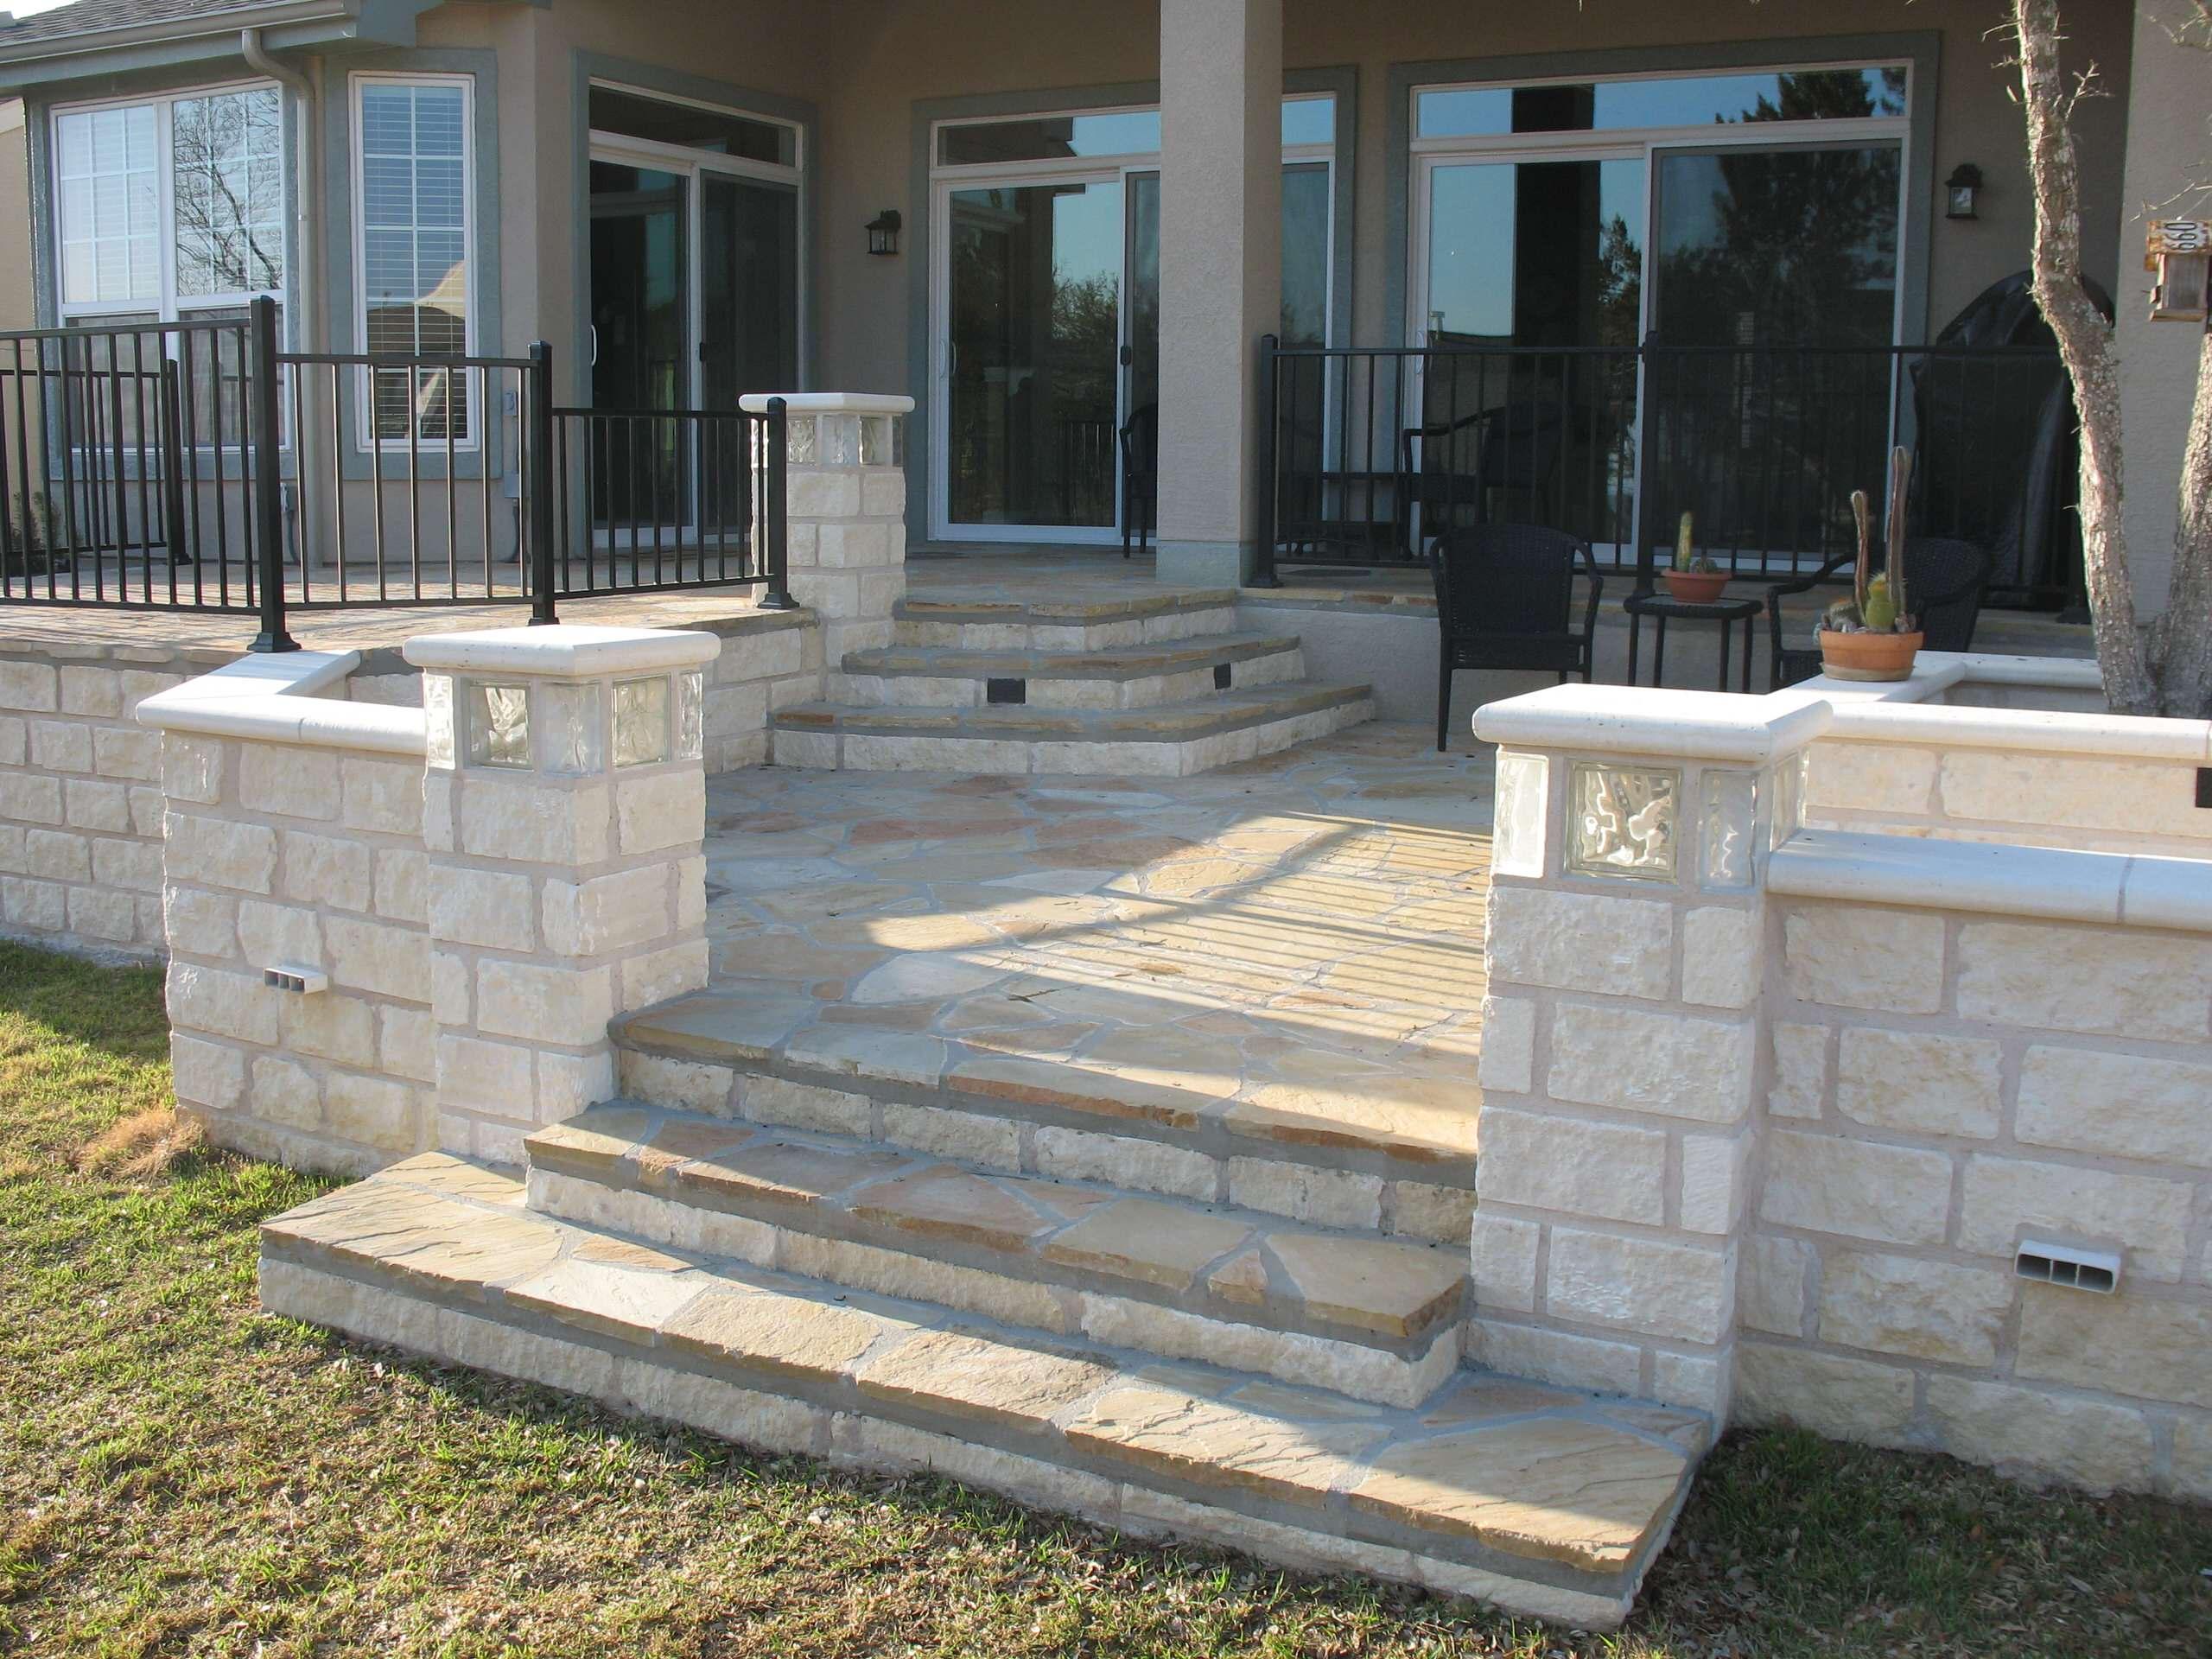 Modern flagstone patio w/ limestone walls, lighted glass block columns